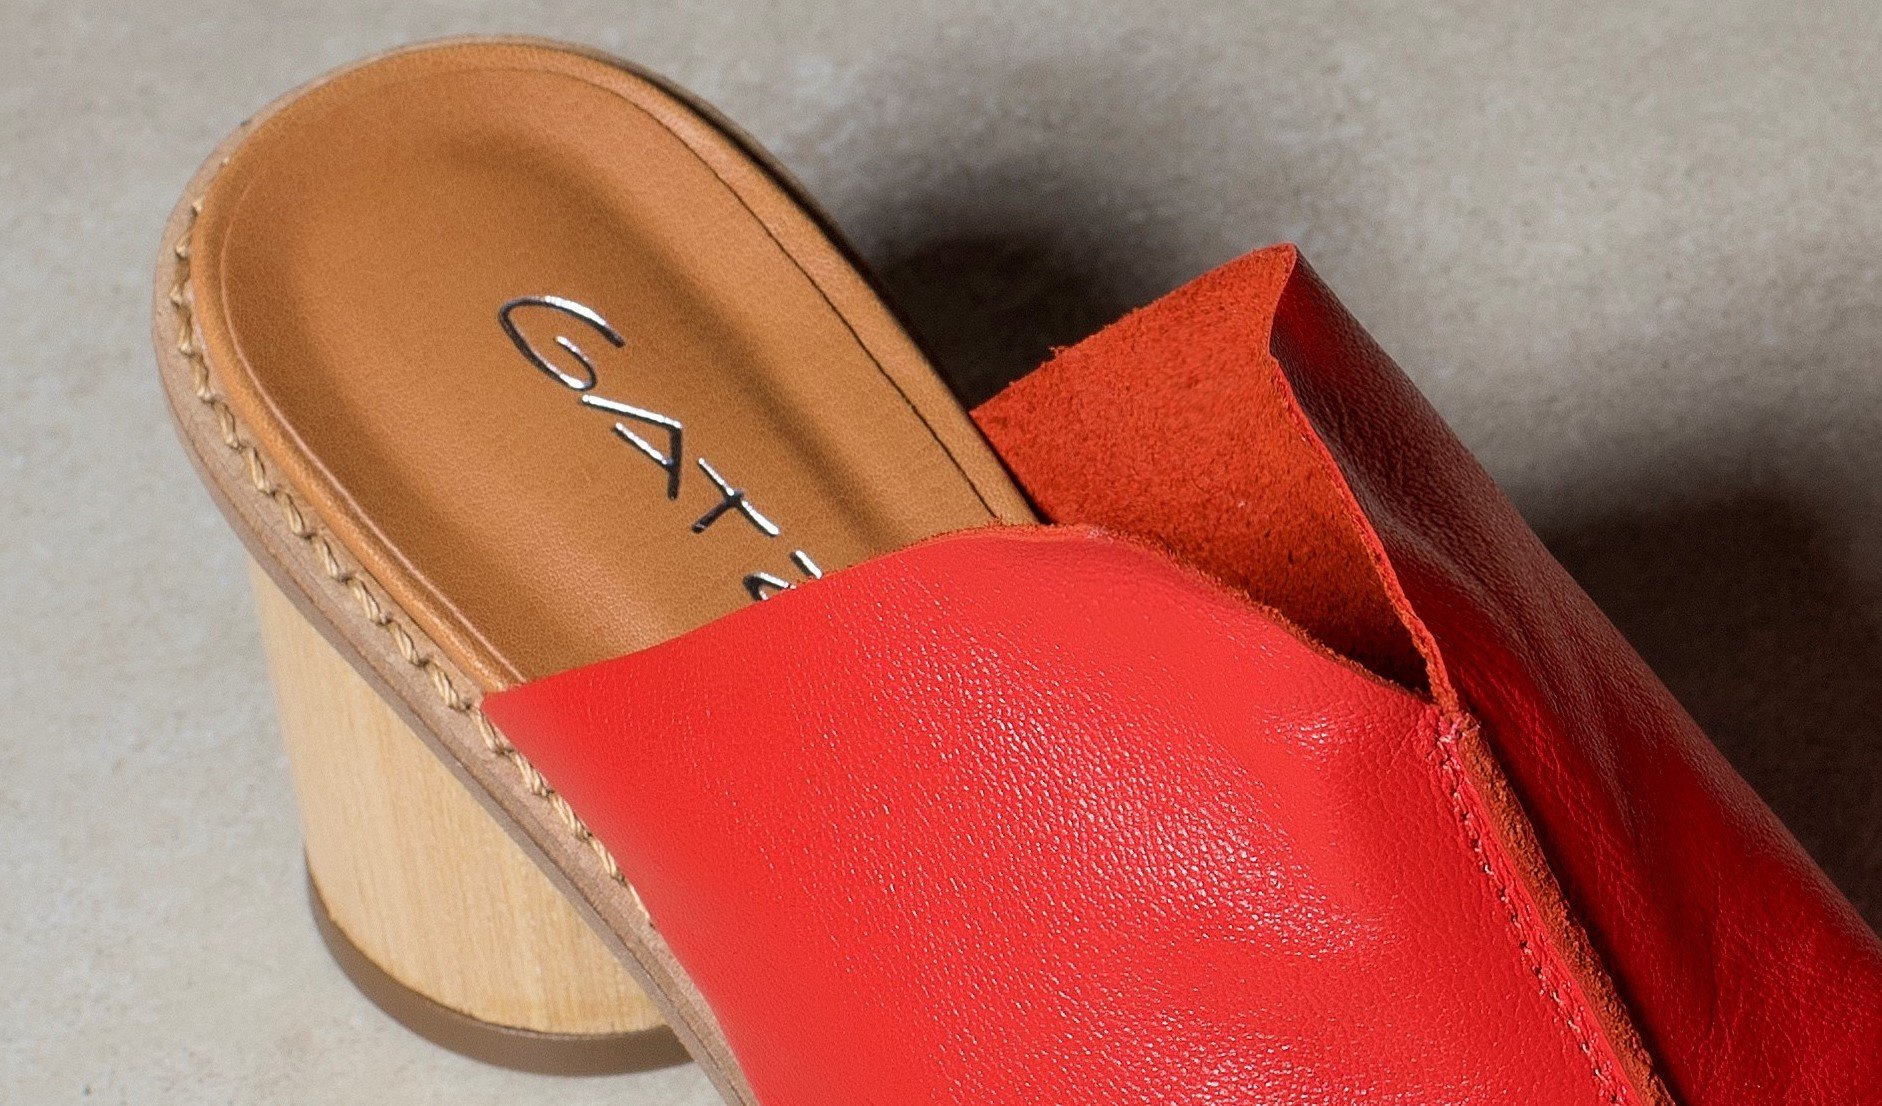 sandalia decote v vermelho 4